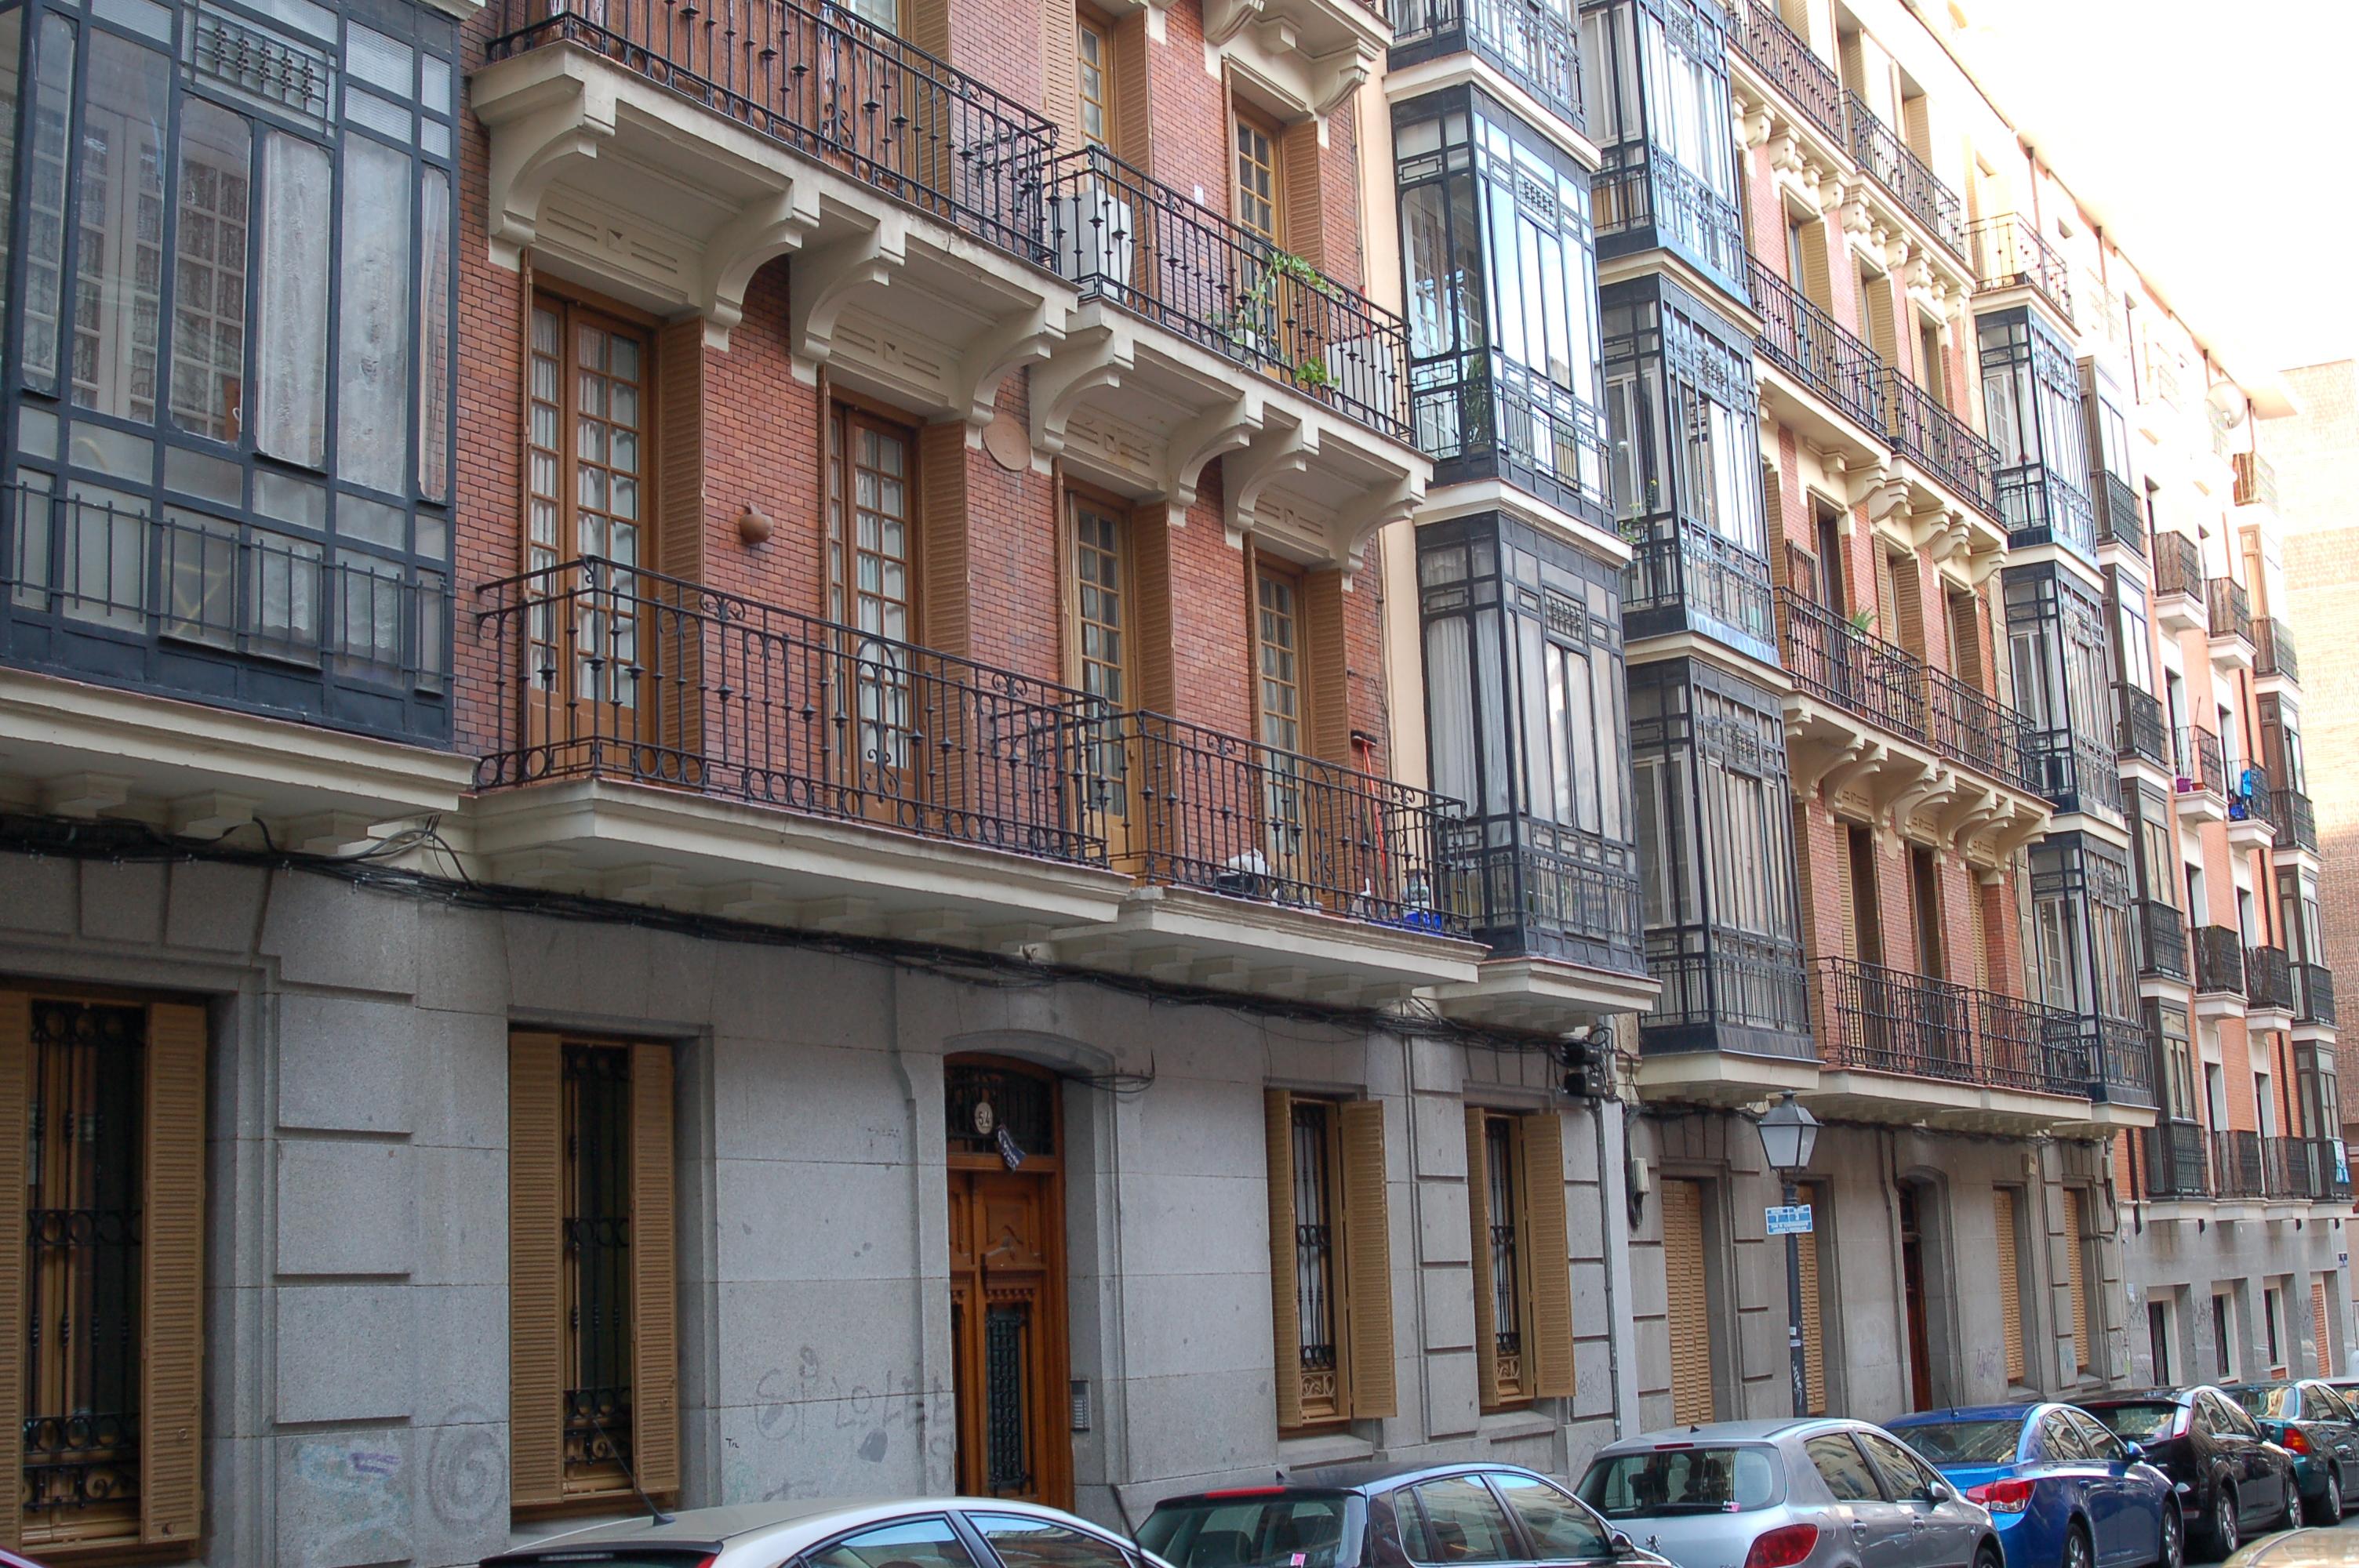 Bienvenidos a ifamisa tu inmobiliaria en madrid - Alquiler de pisos estudiantes madrid ...